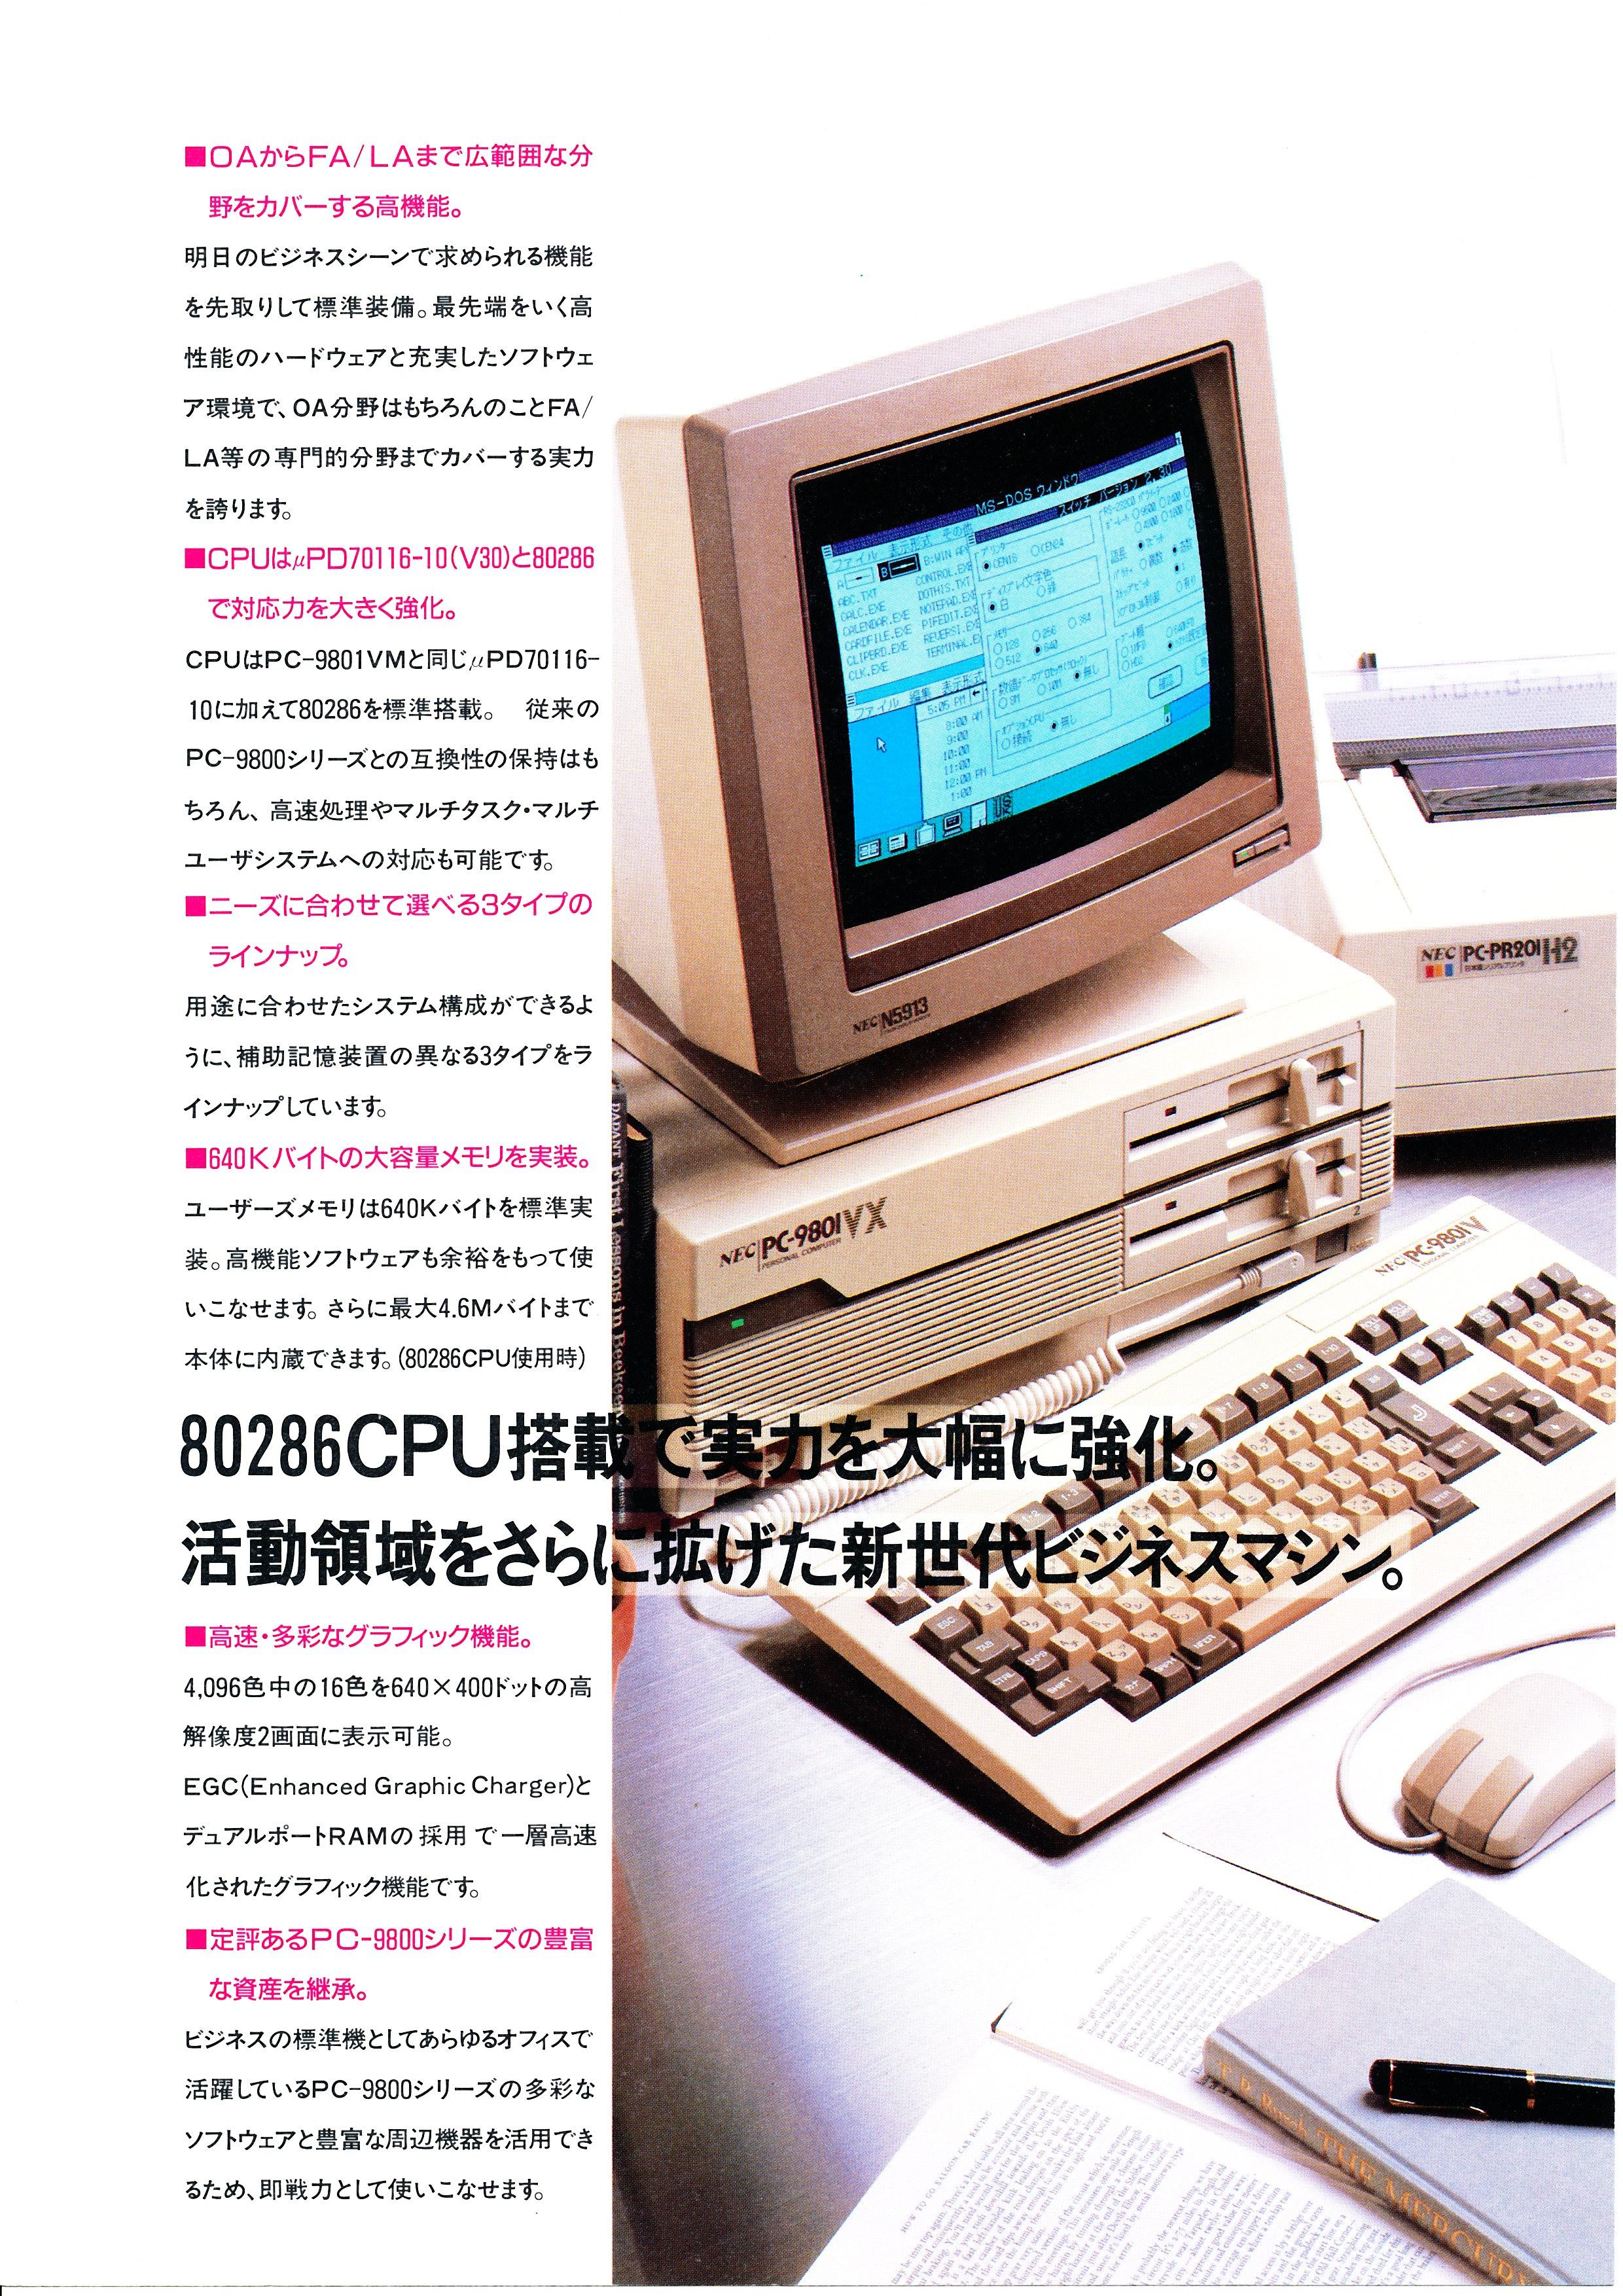 PC-9801VX P2